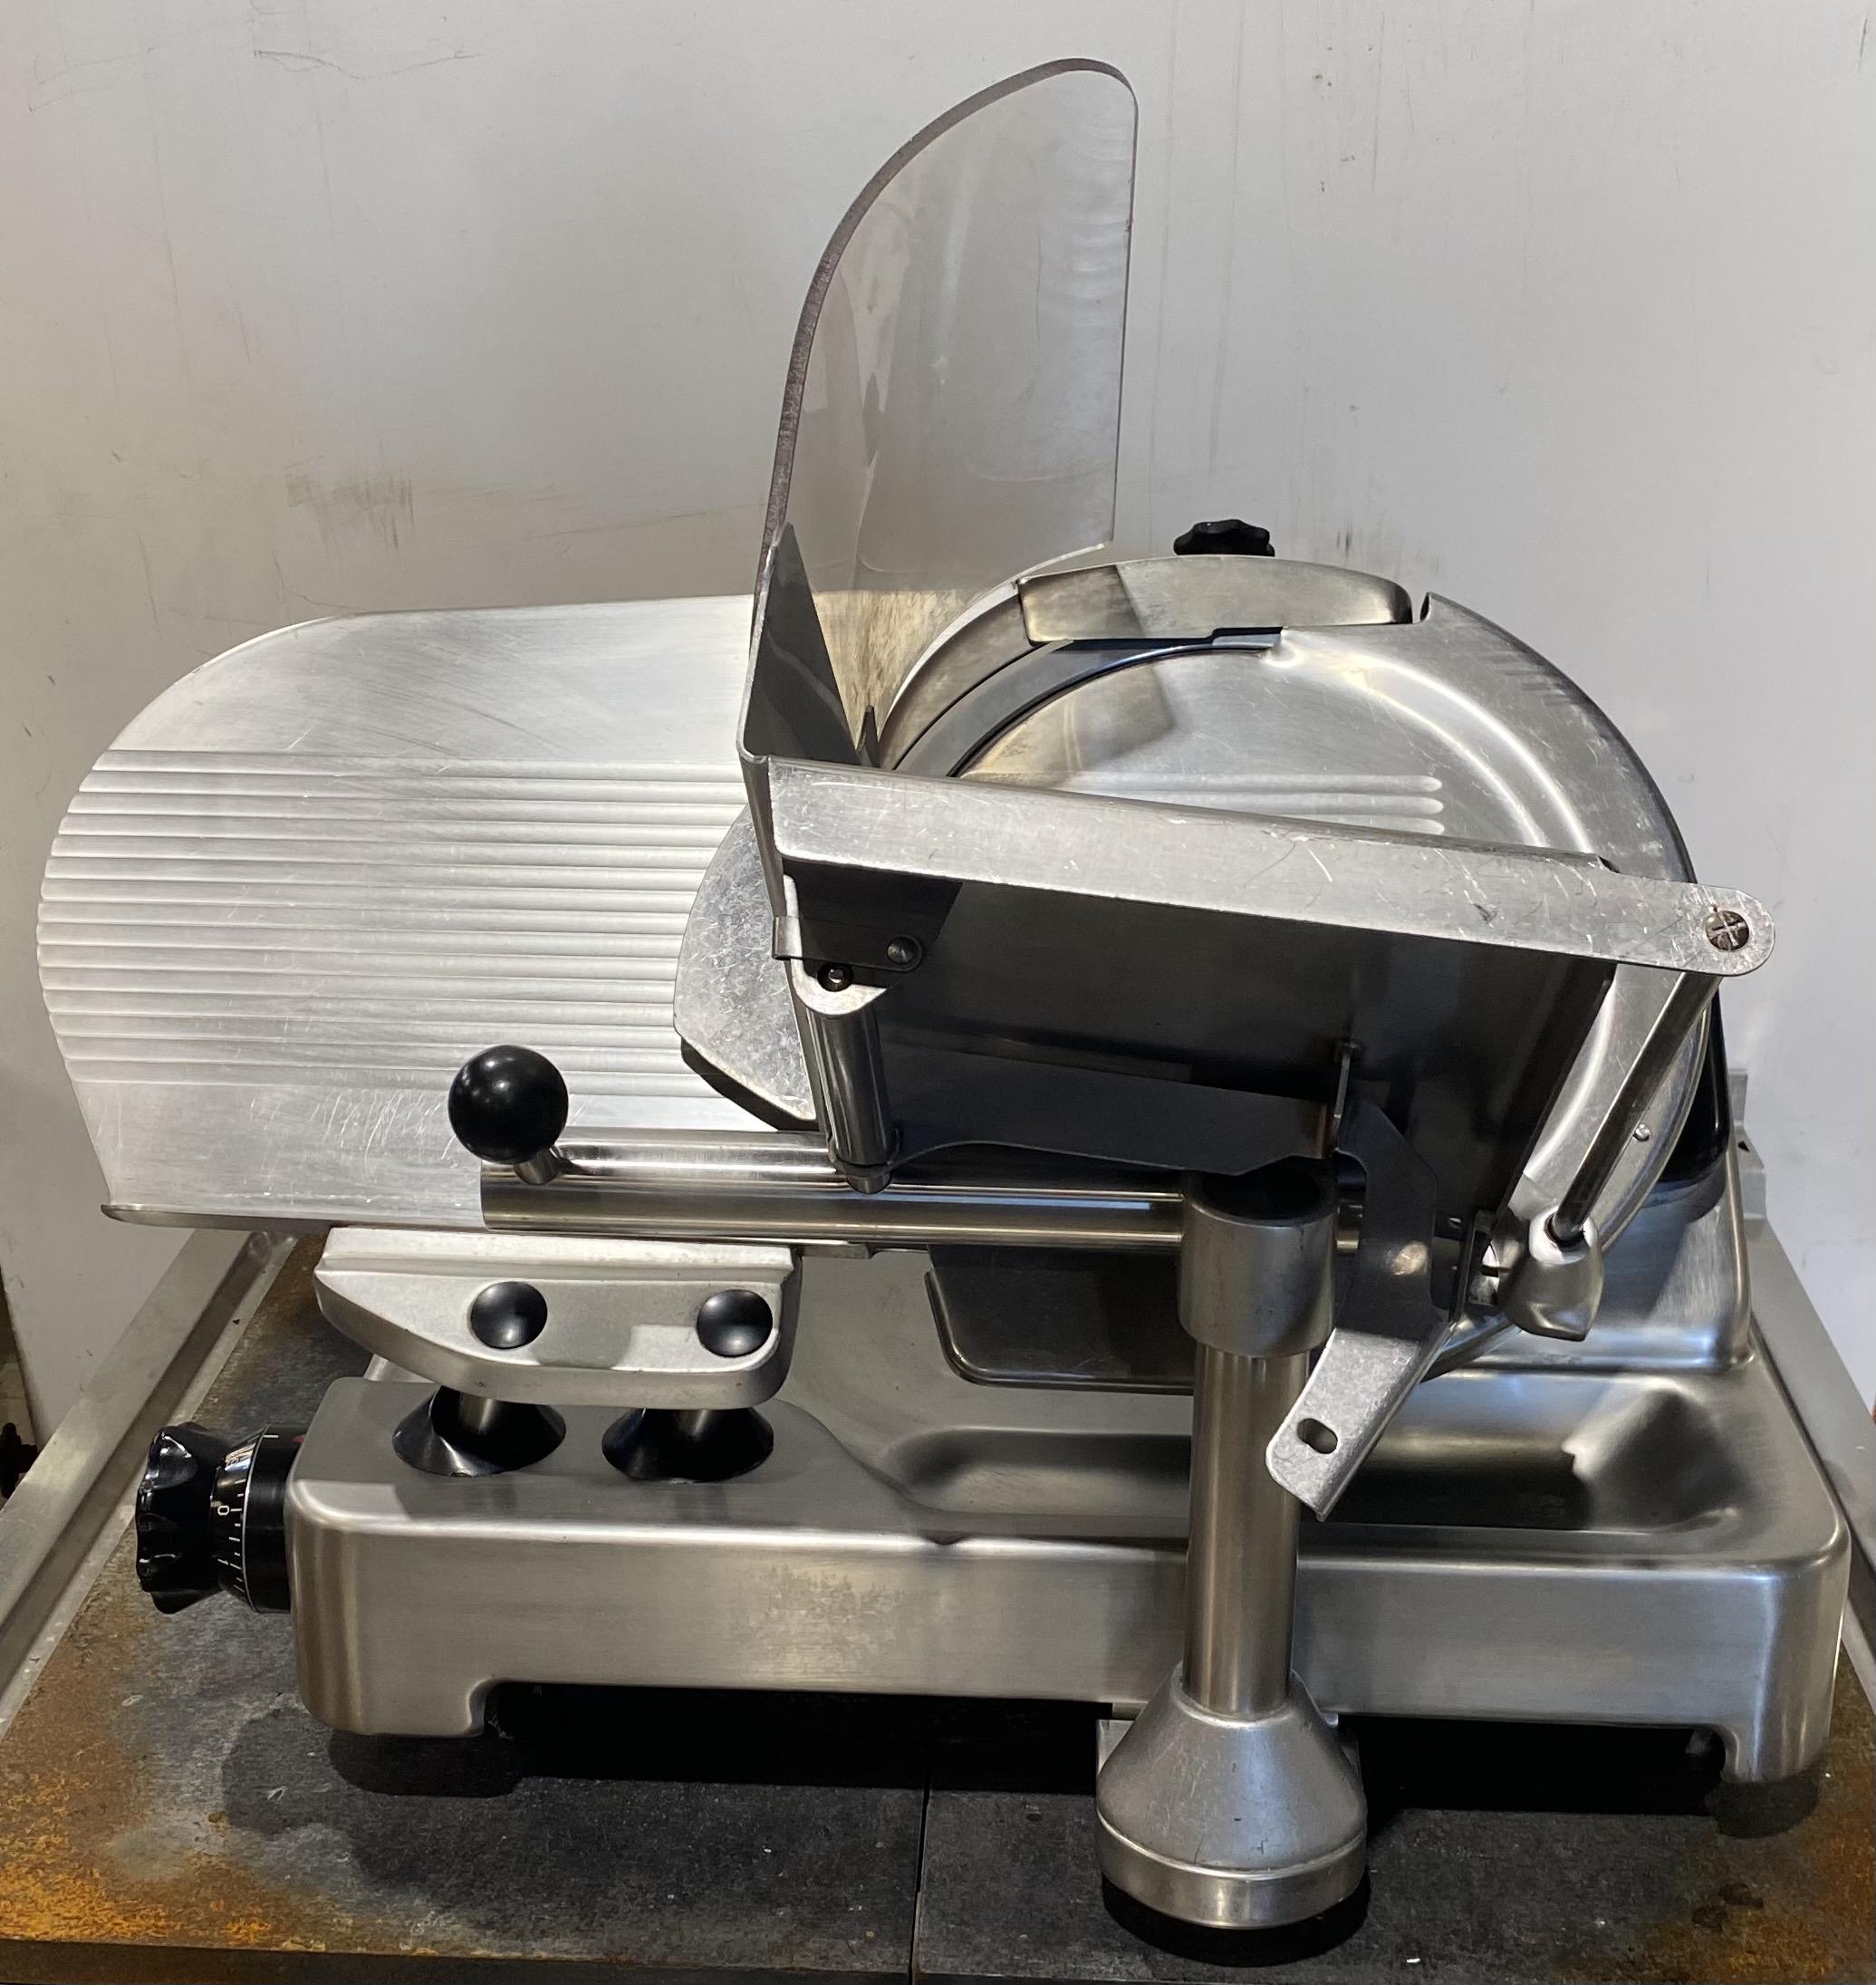 AVERY BERKEL 800 12 inch Gravity Feed Meat Slicer